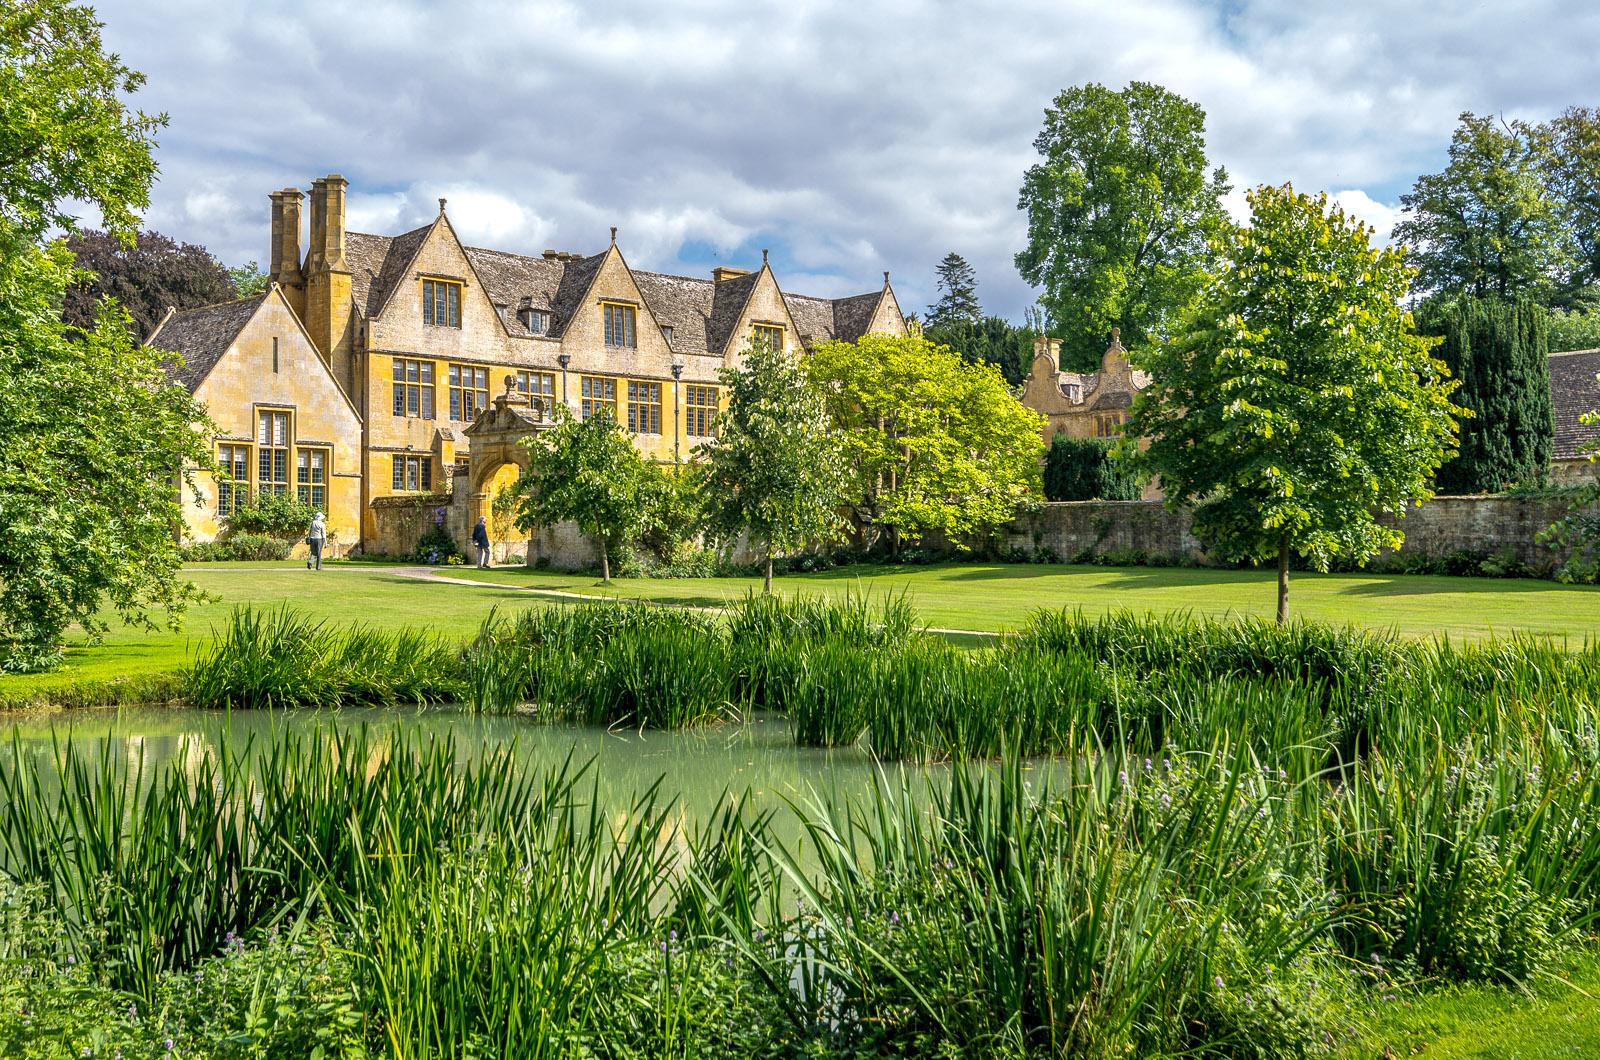 Stanway House, Stanway, Gloucestershire by Bob Radlinski.jpg